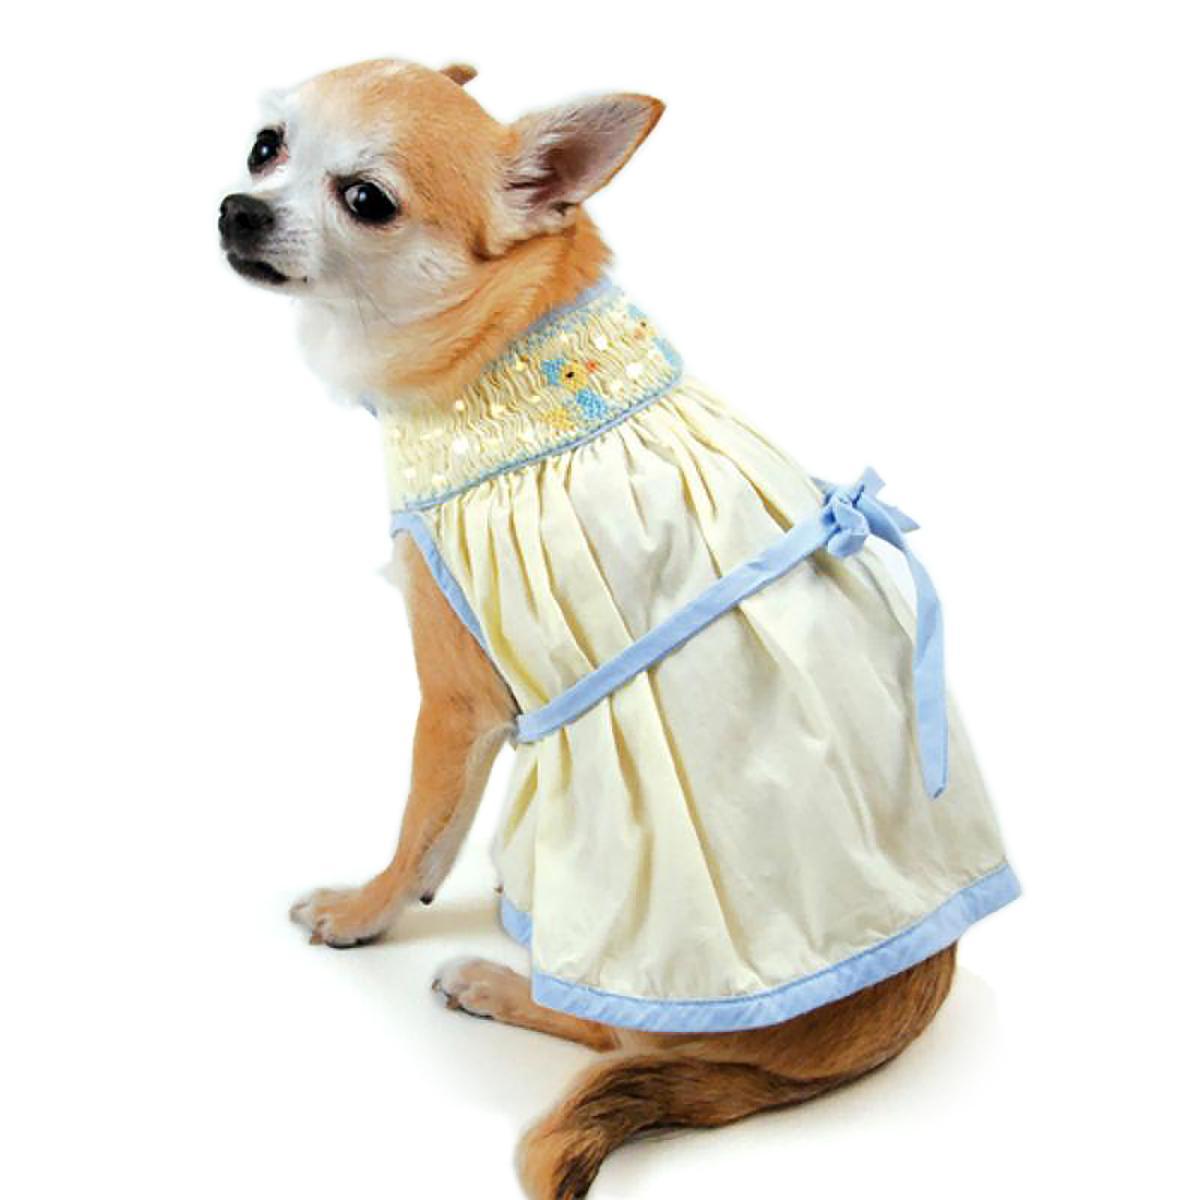 Duckie Hand-Smocked Bishop Dog Dress By Oscar Newman